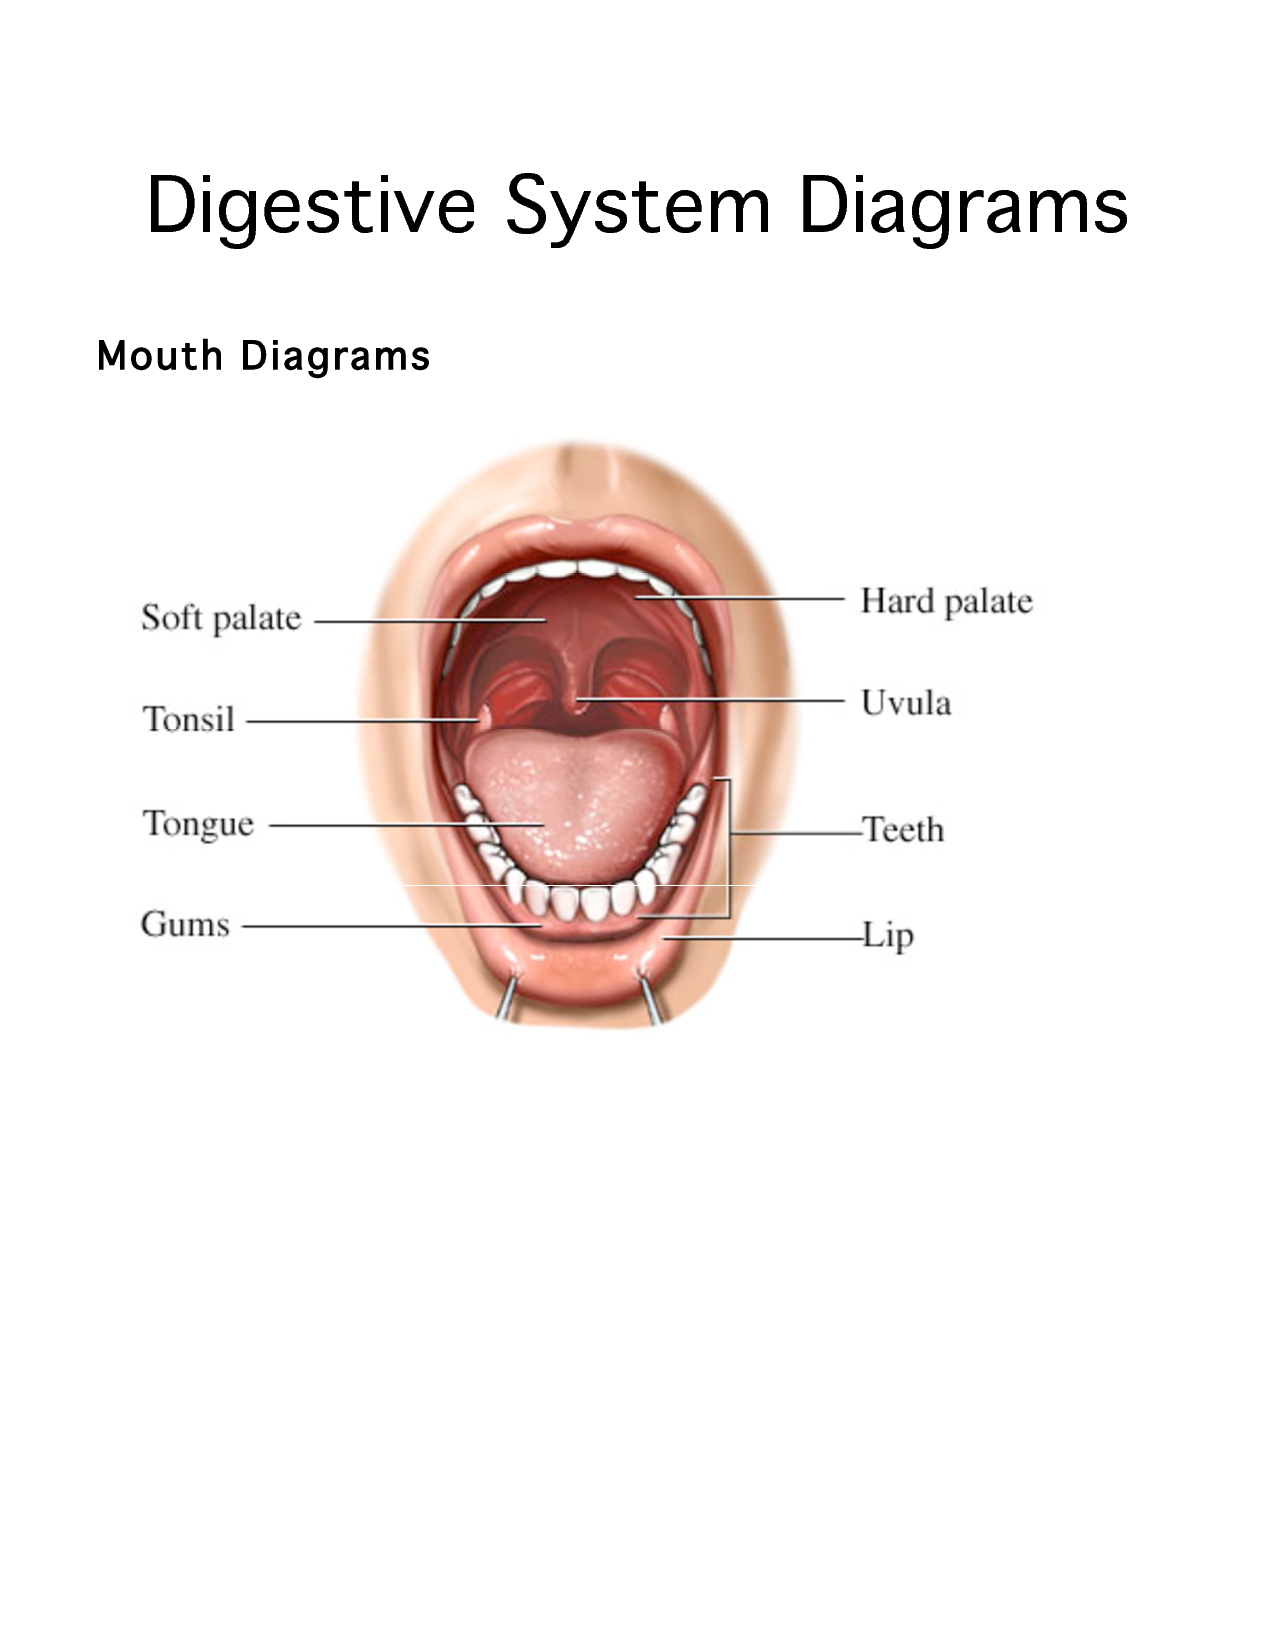 Human digestive system diagram digestive system diagrams mouth human digestive system diagram digestive system diagrams mouth diagrams salivary glands anatomy o pooptronica